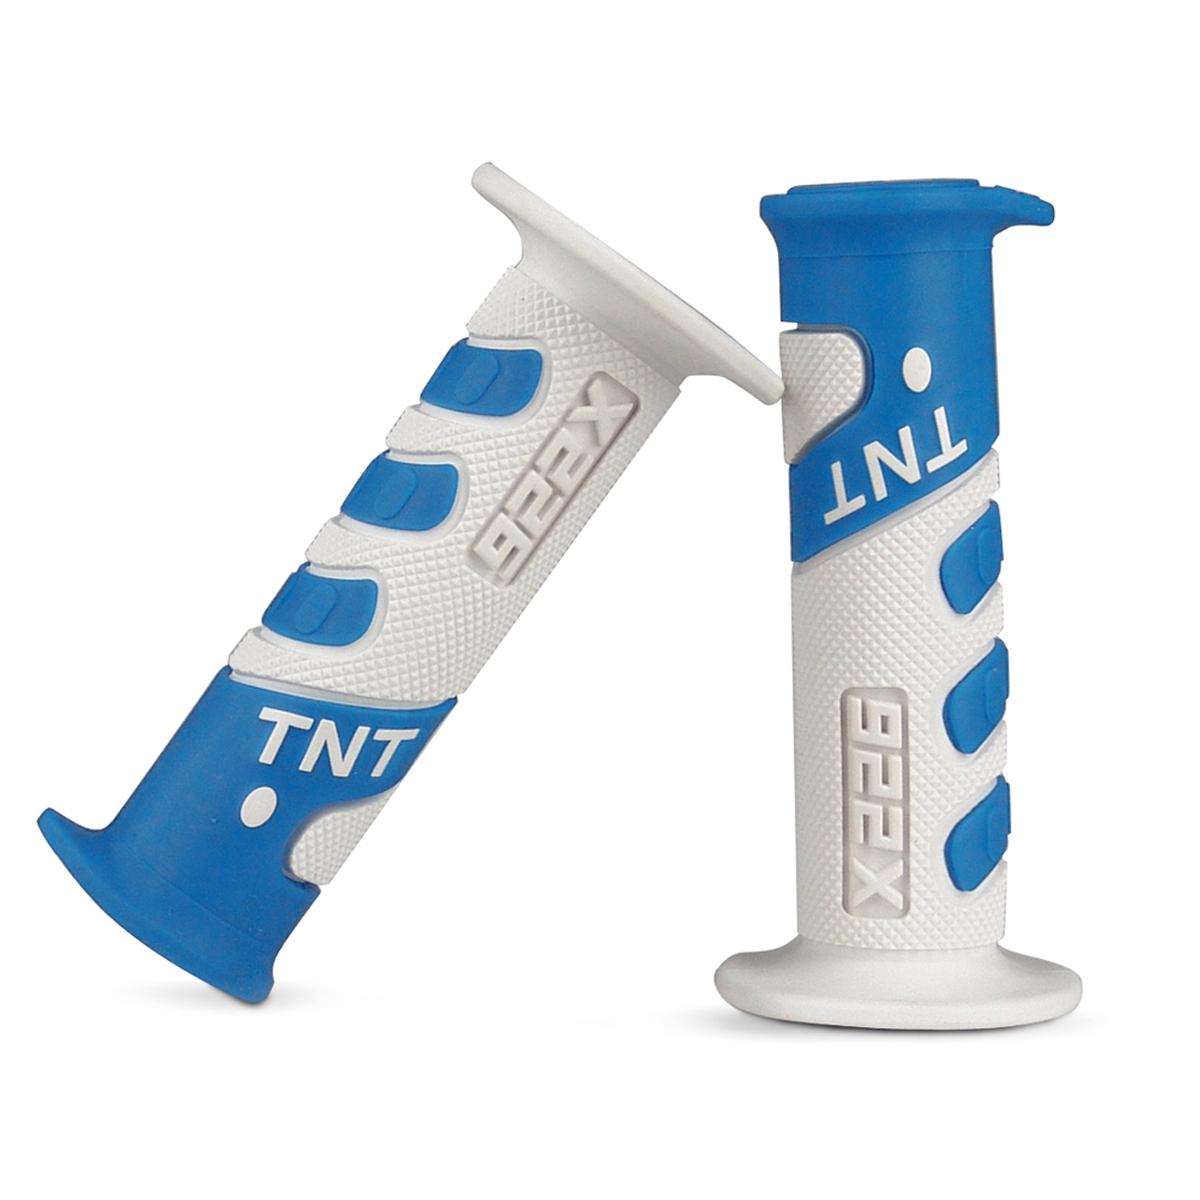 Revêtement poignée TNT cross blanc/bleu ciel 922x